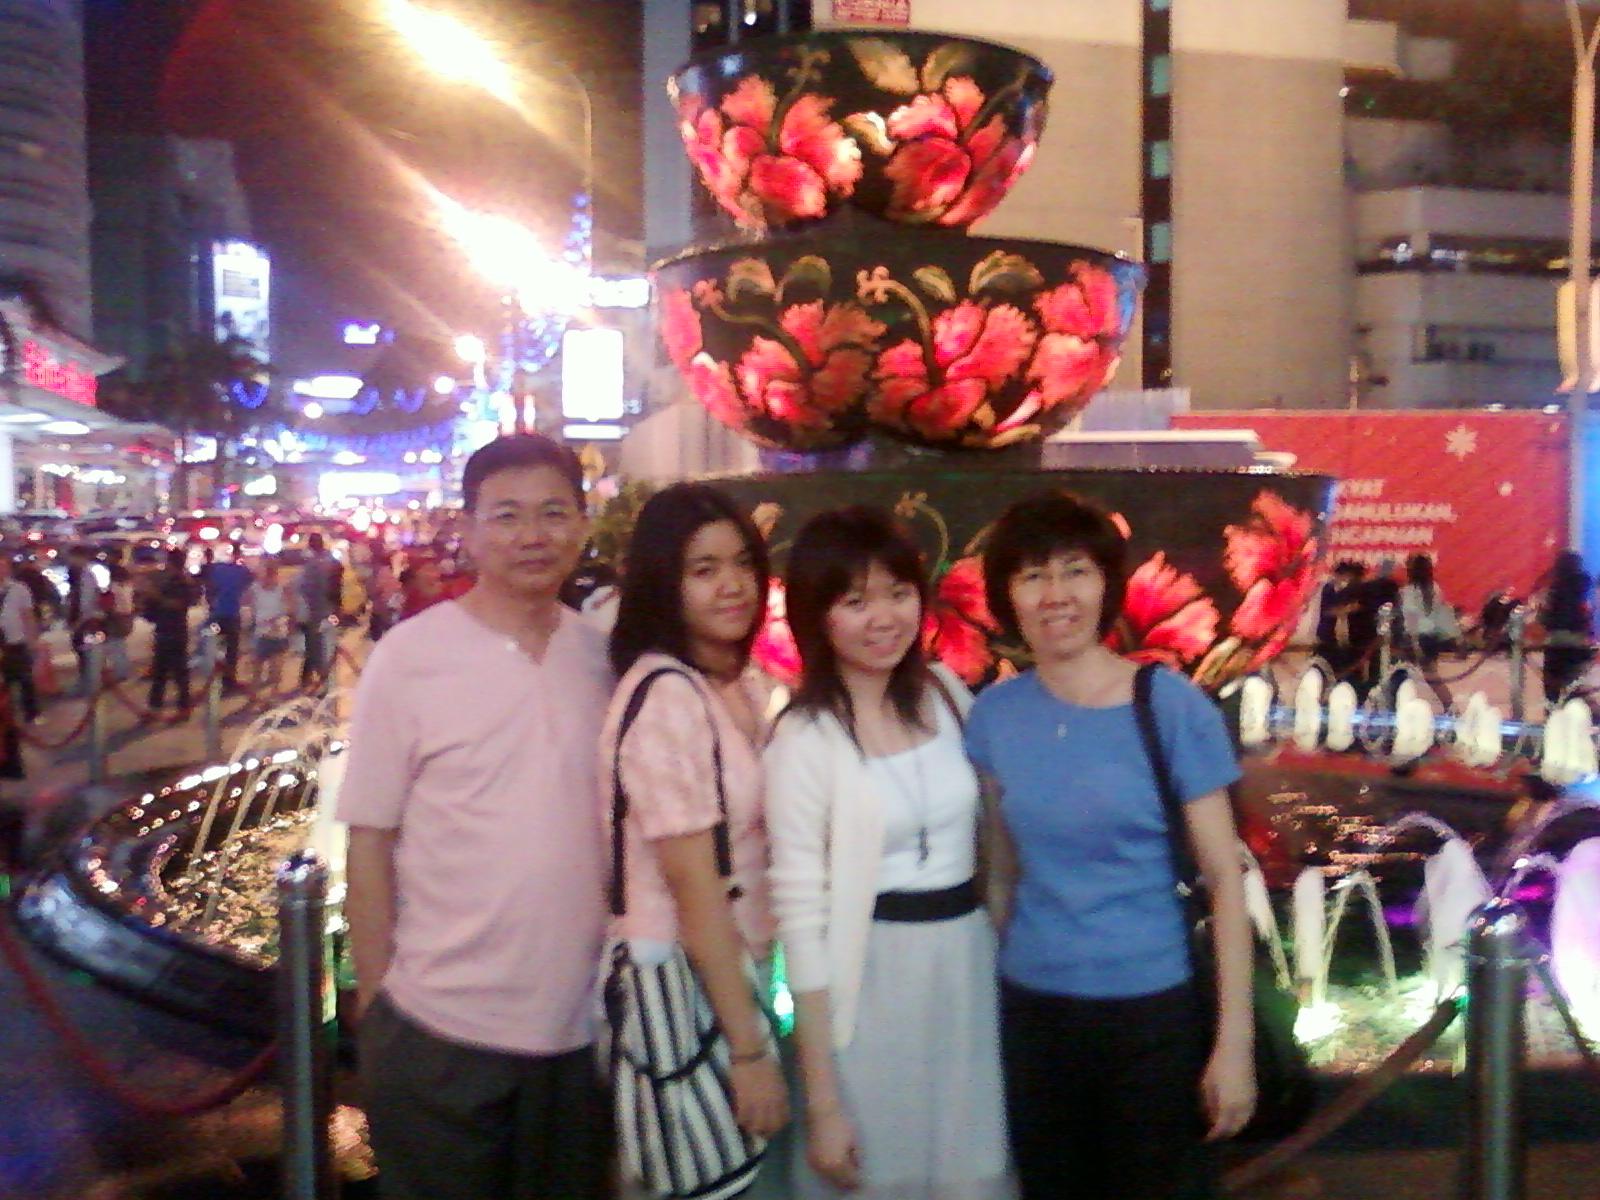 http://1.bp.blogspot.com/-U2Lm2g13joA/TpB-Gk5imGI/AAAAAAAAC44/foqPj4wH1NQ/s1600/Photo3110.jpg